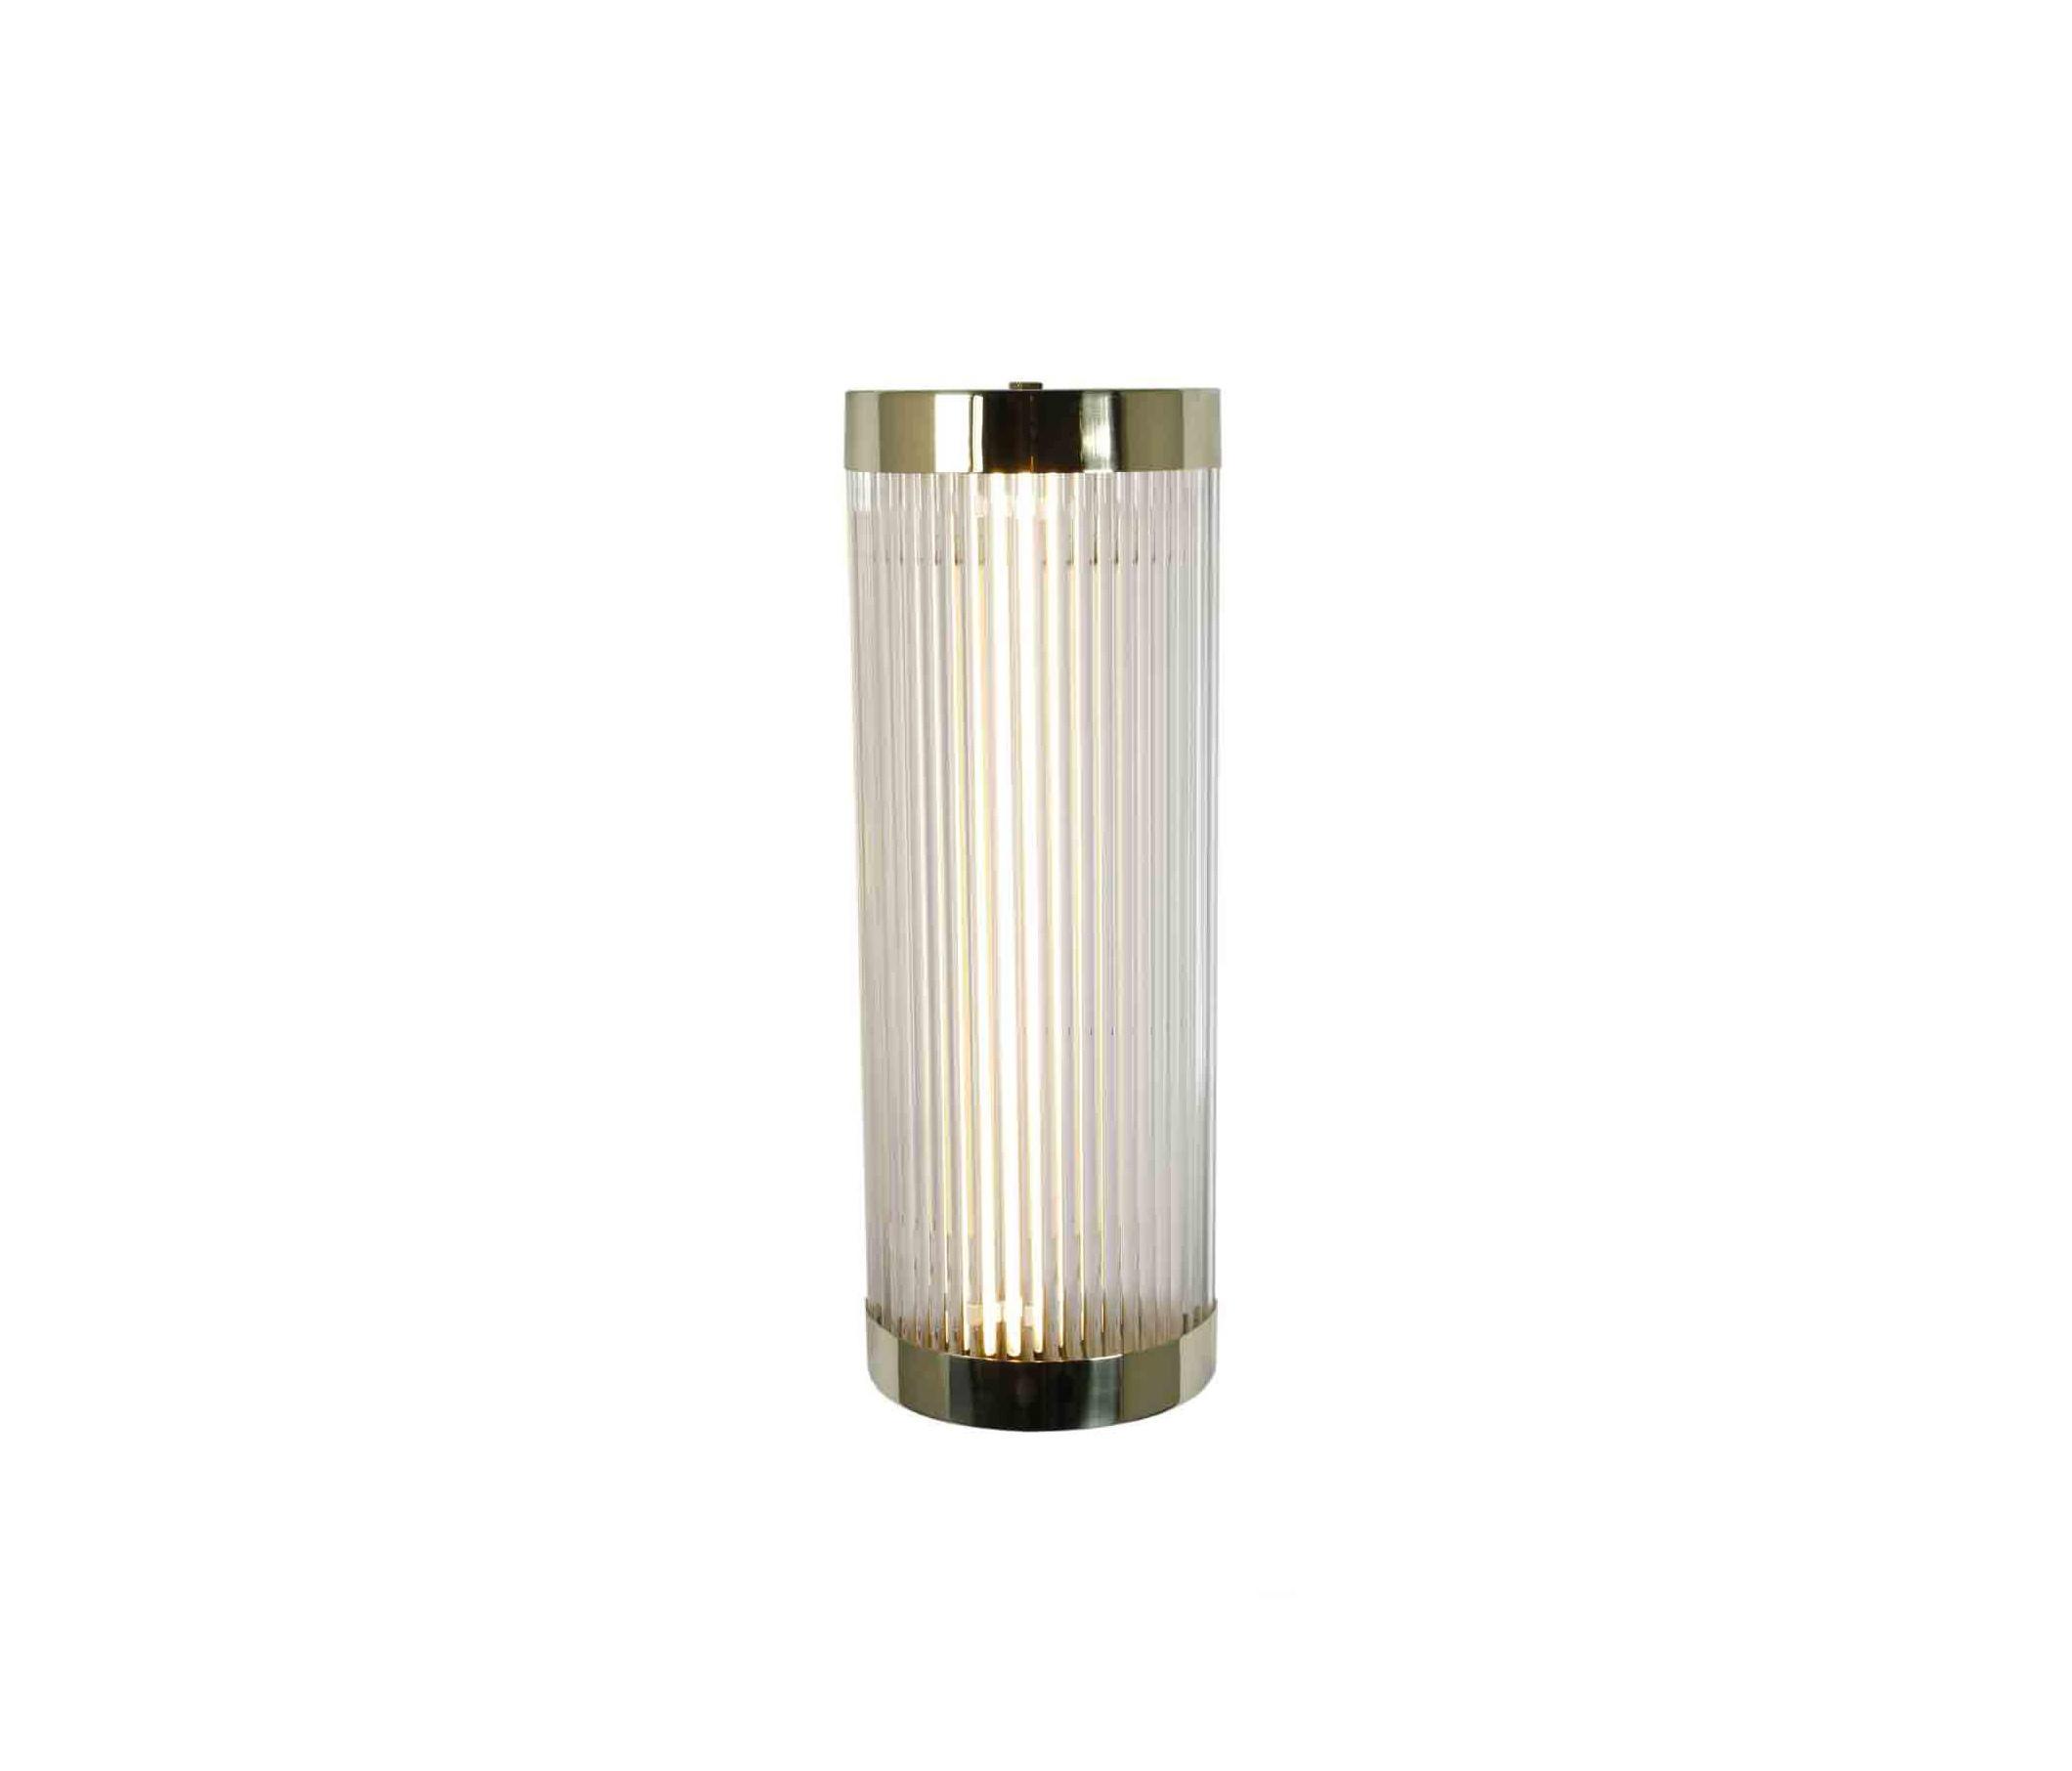 7210 Pillar Led Wall Light 40 15cm Polished Br By Original Btc